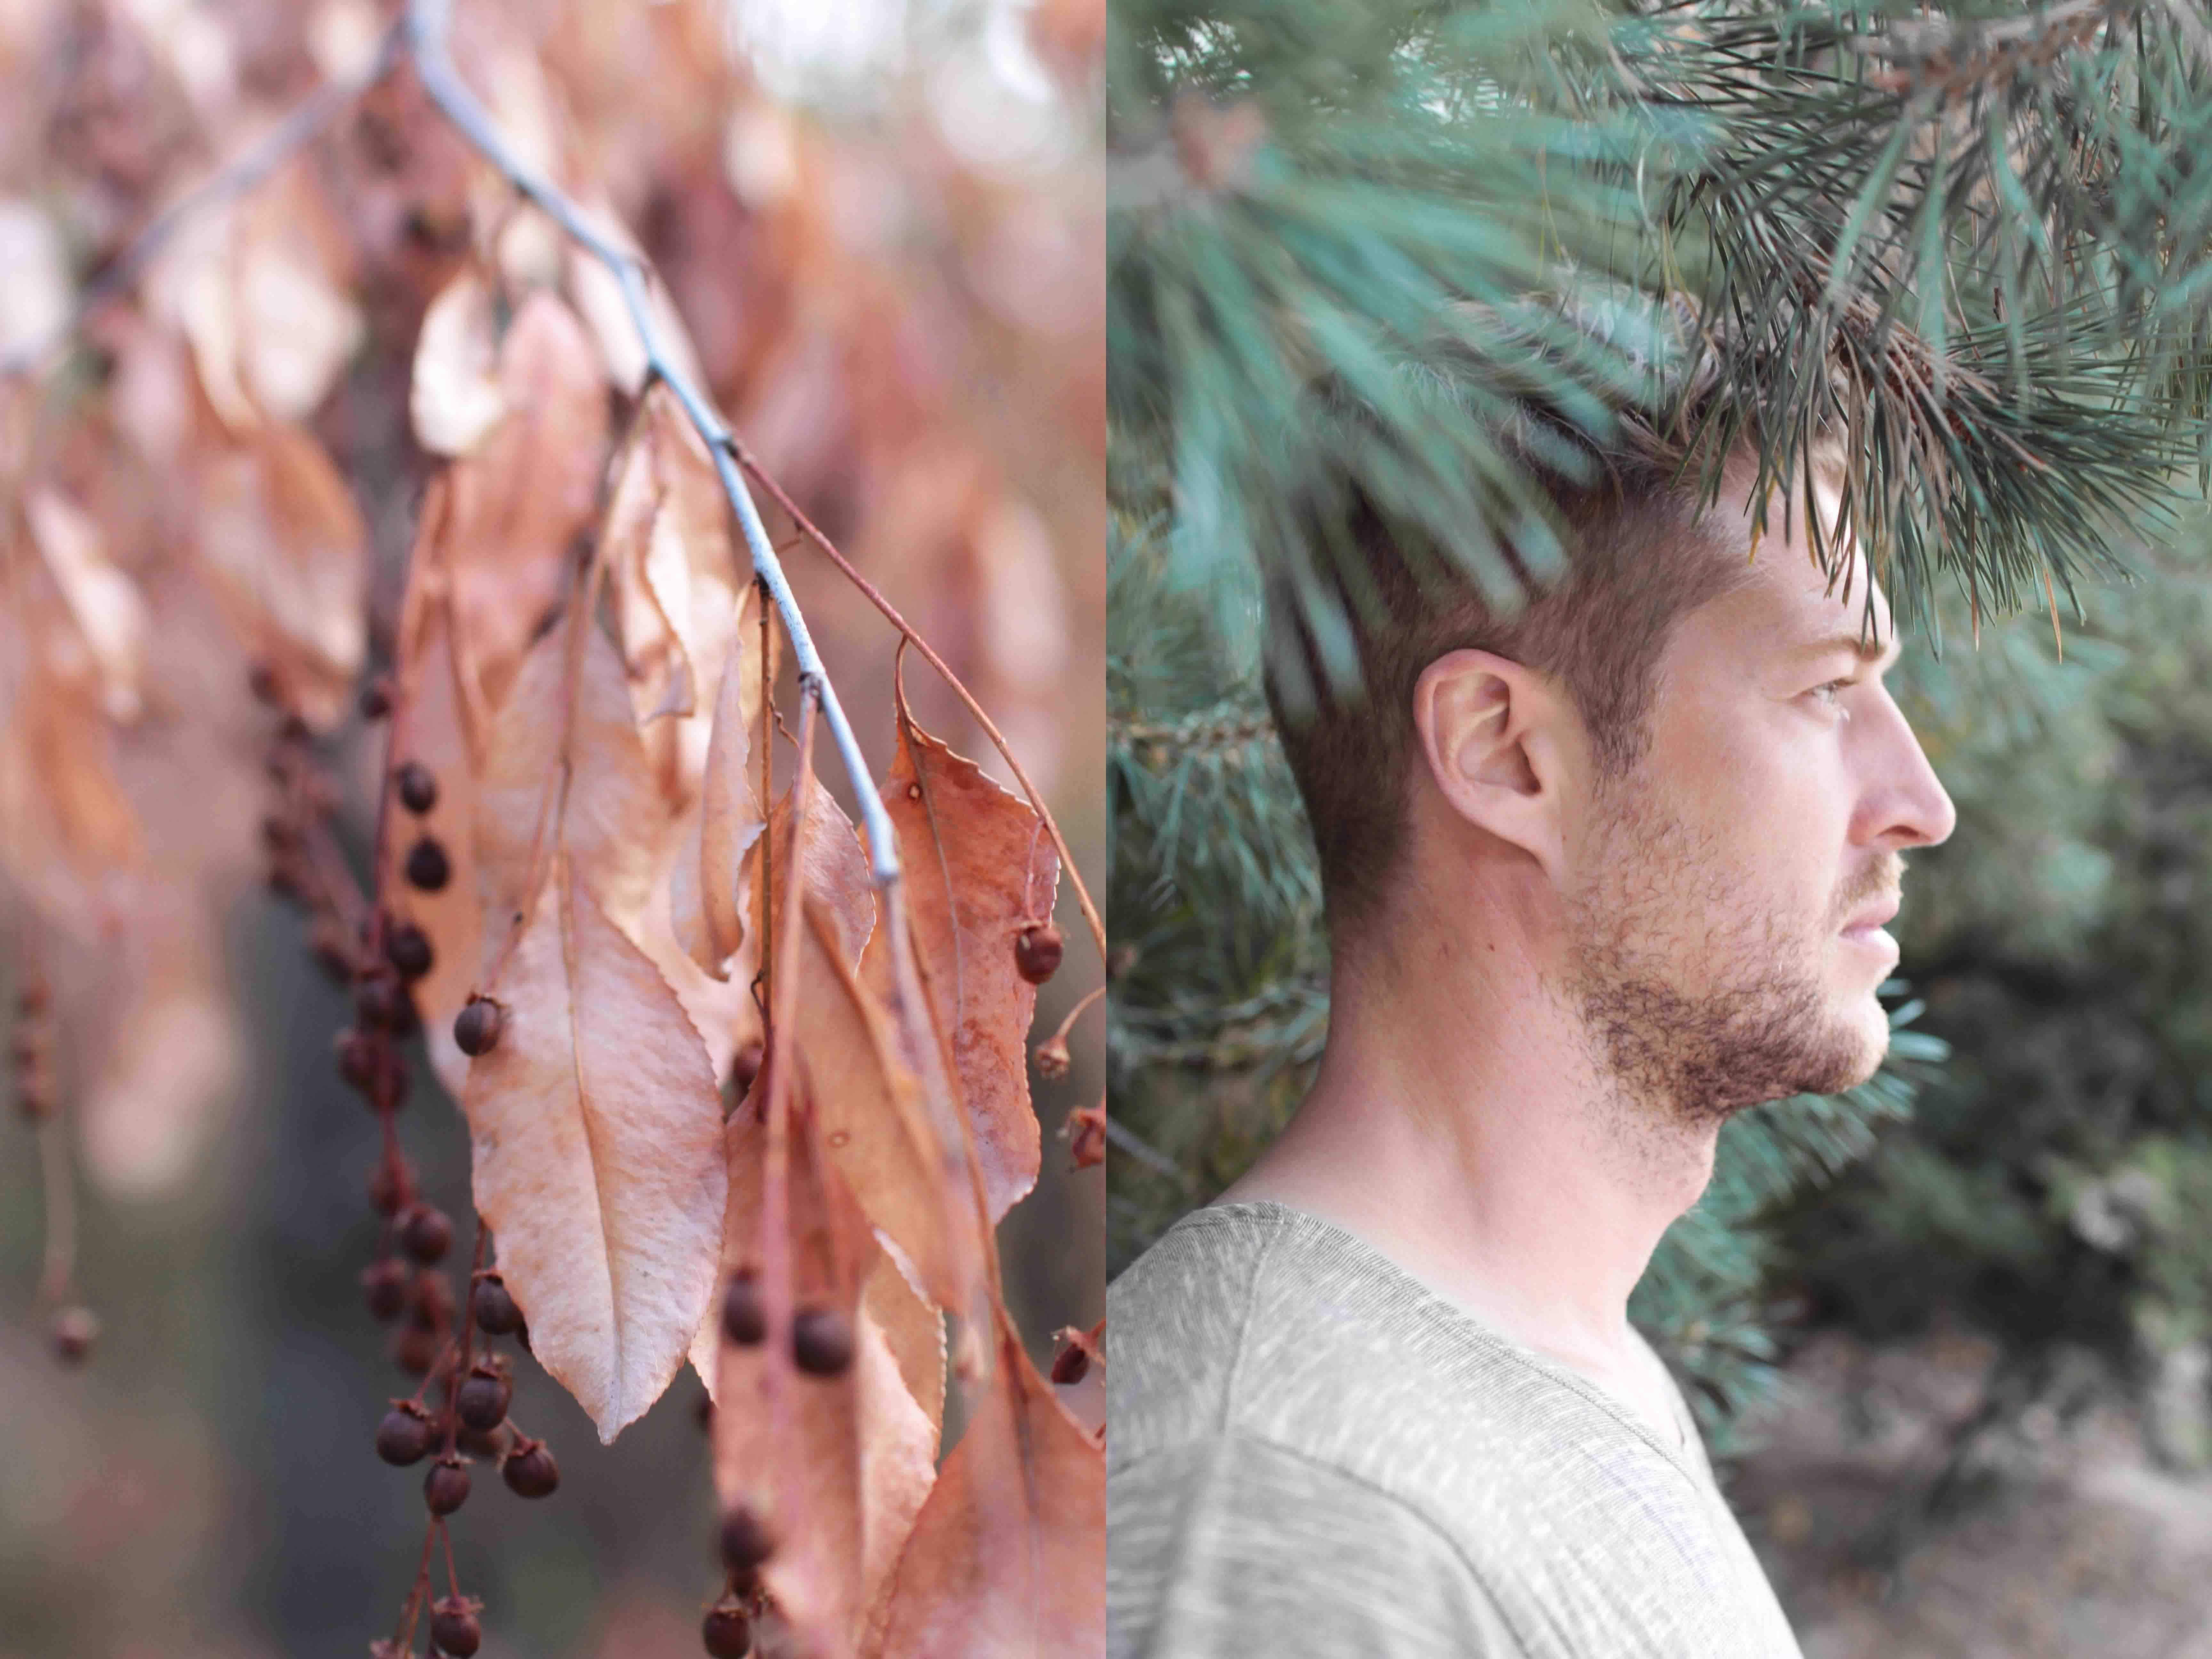 woodland naturalliving lifestylephotography lifestylefotografie by kyra de vreeze